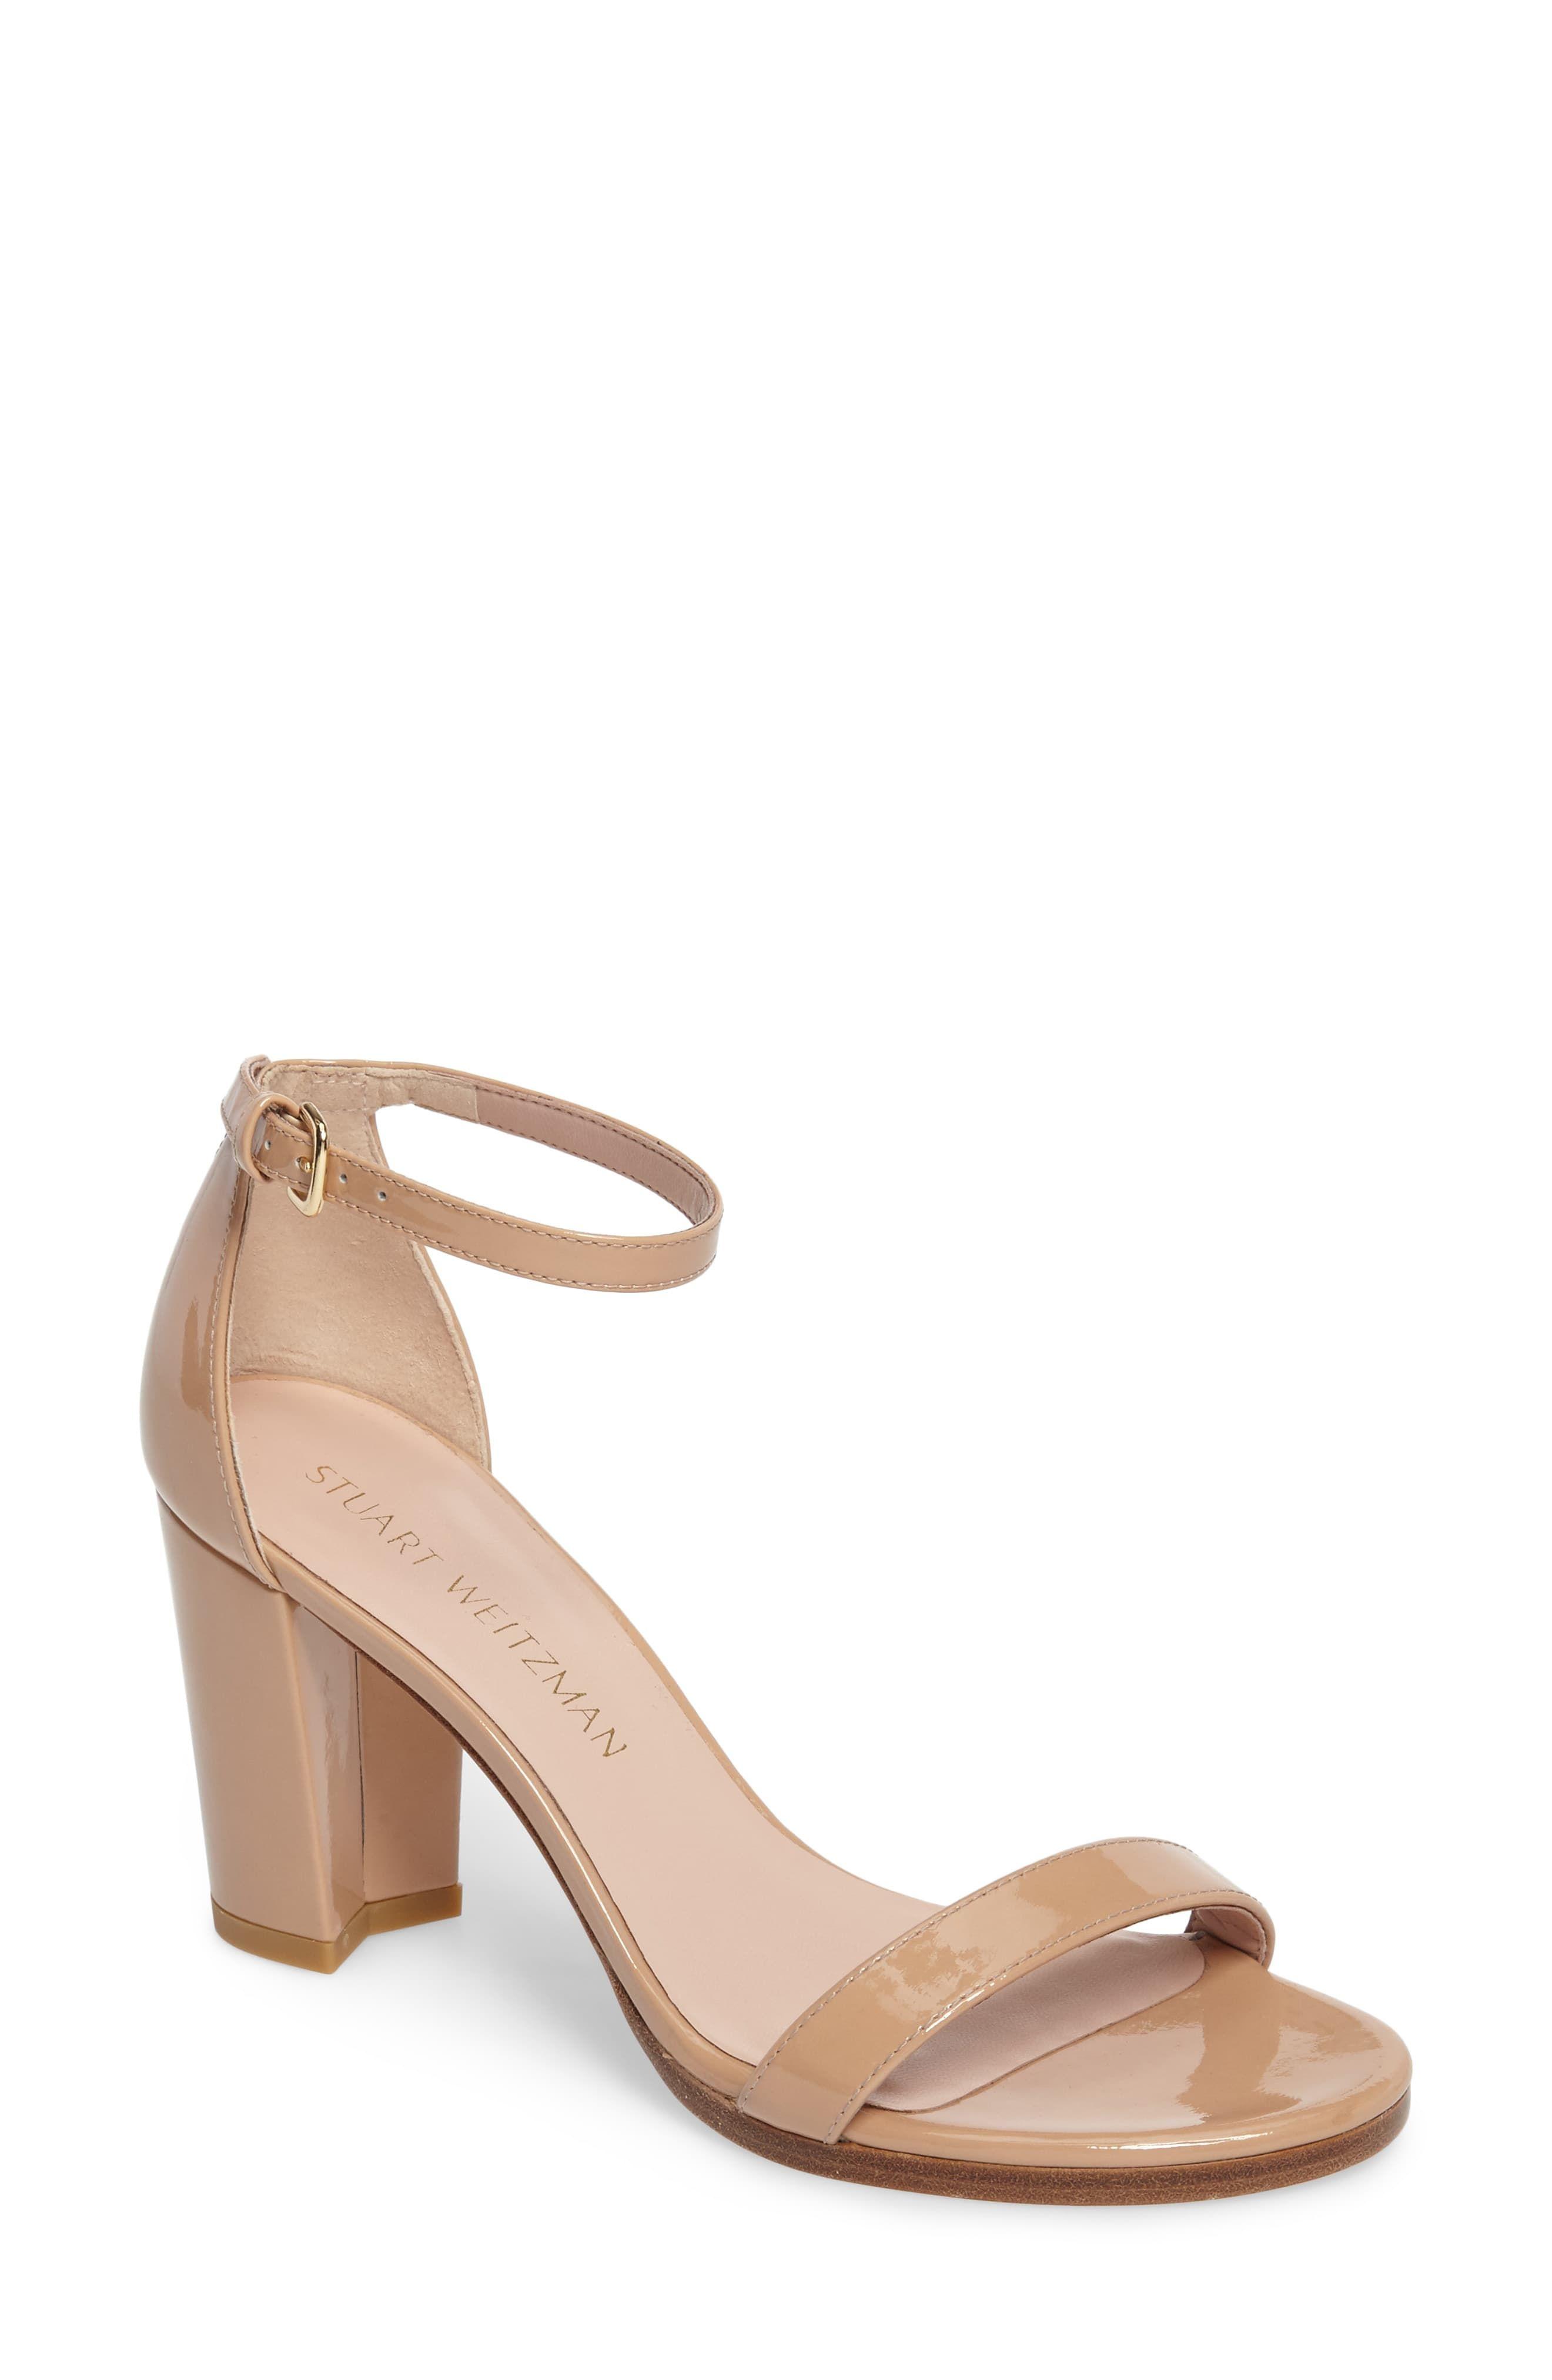 e32bb64d08b Women's Stuart Weitzman Nearlynude Ankle Strap Sandal, Size 6.5 M ...